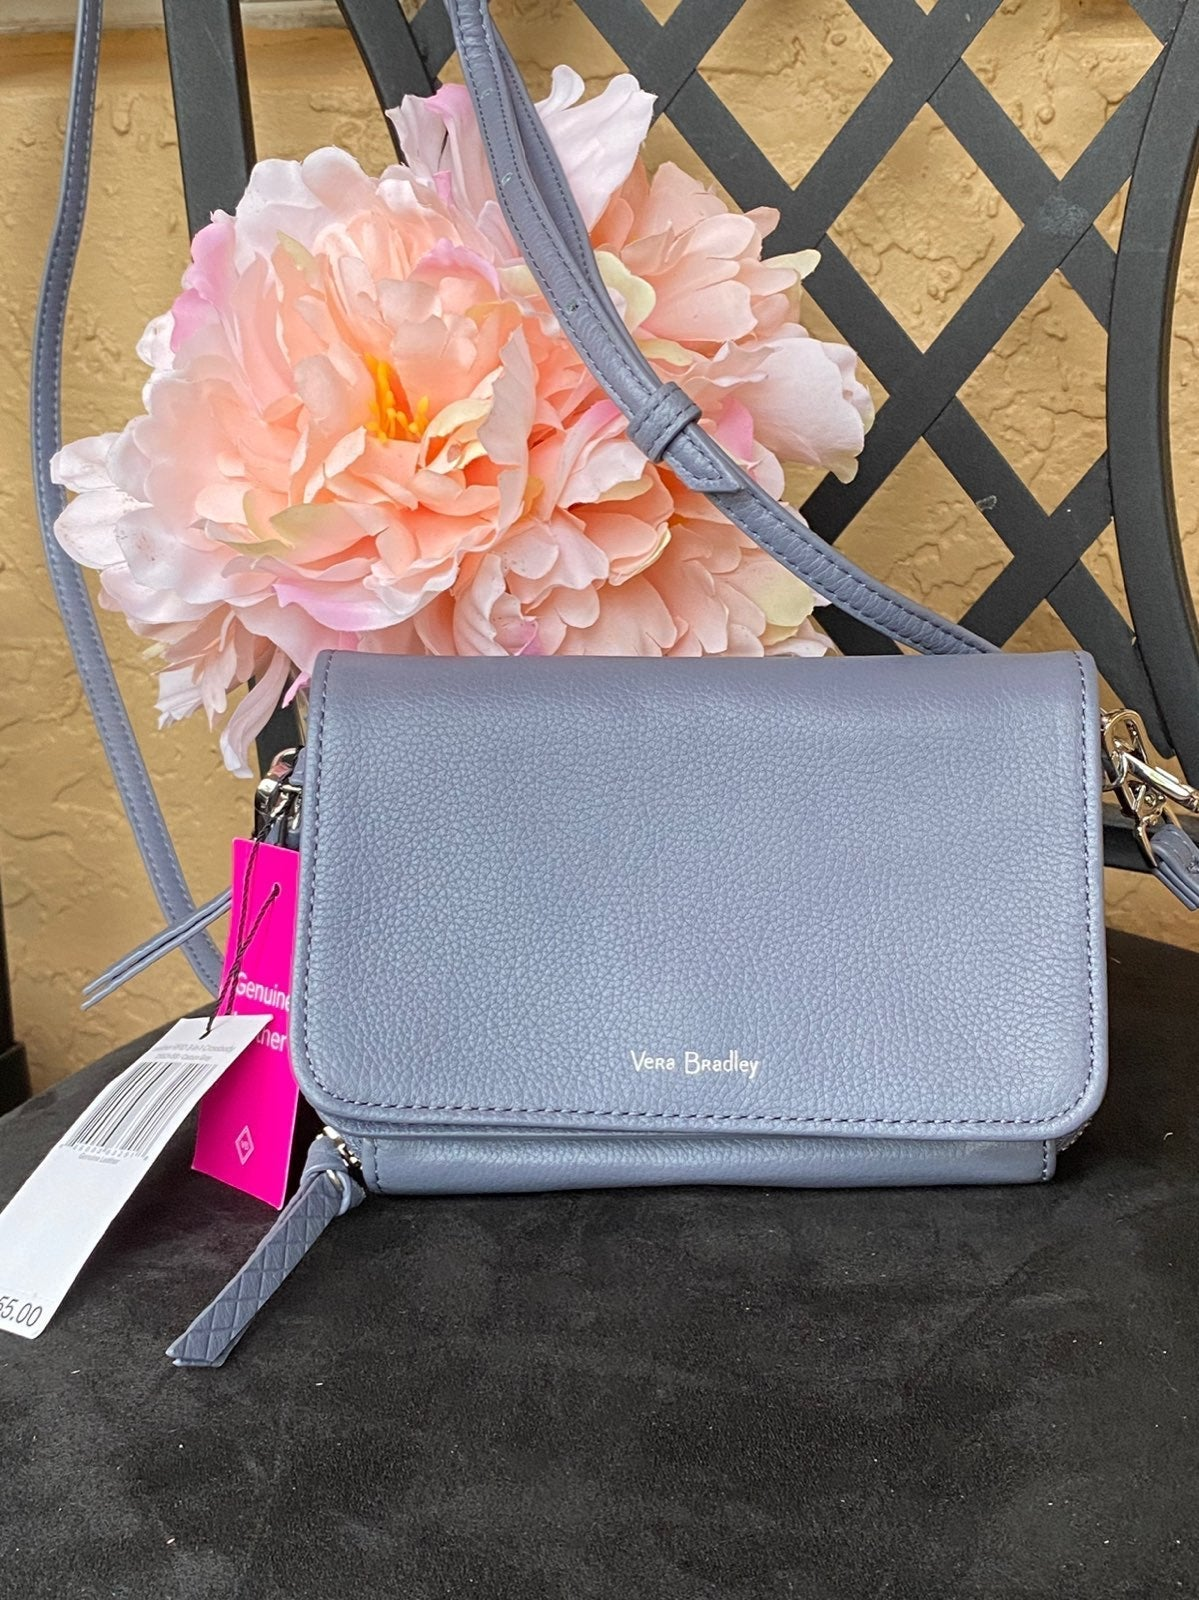 Vera Bradley RFID Leather Crossbag 3in1